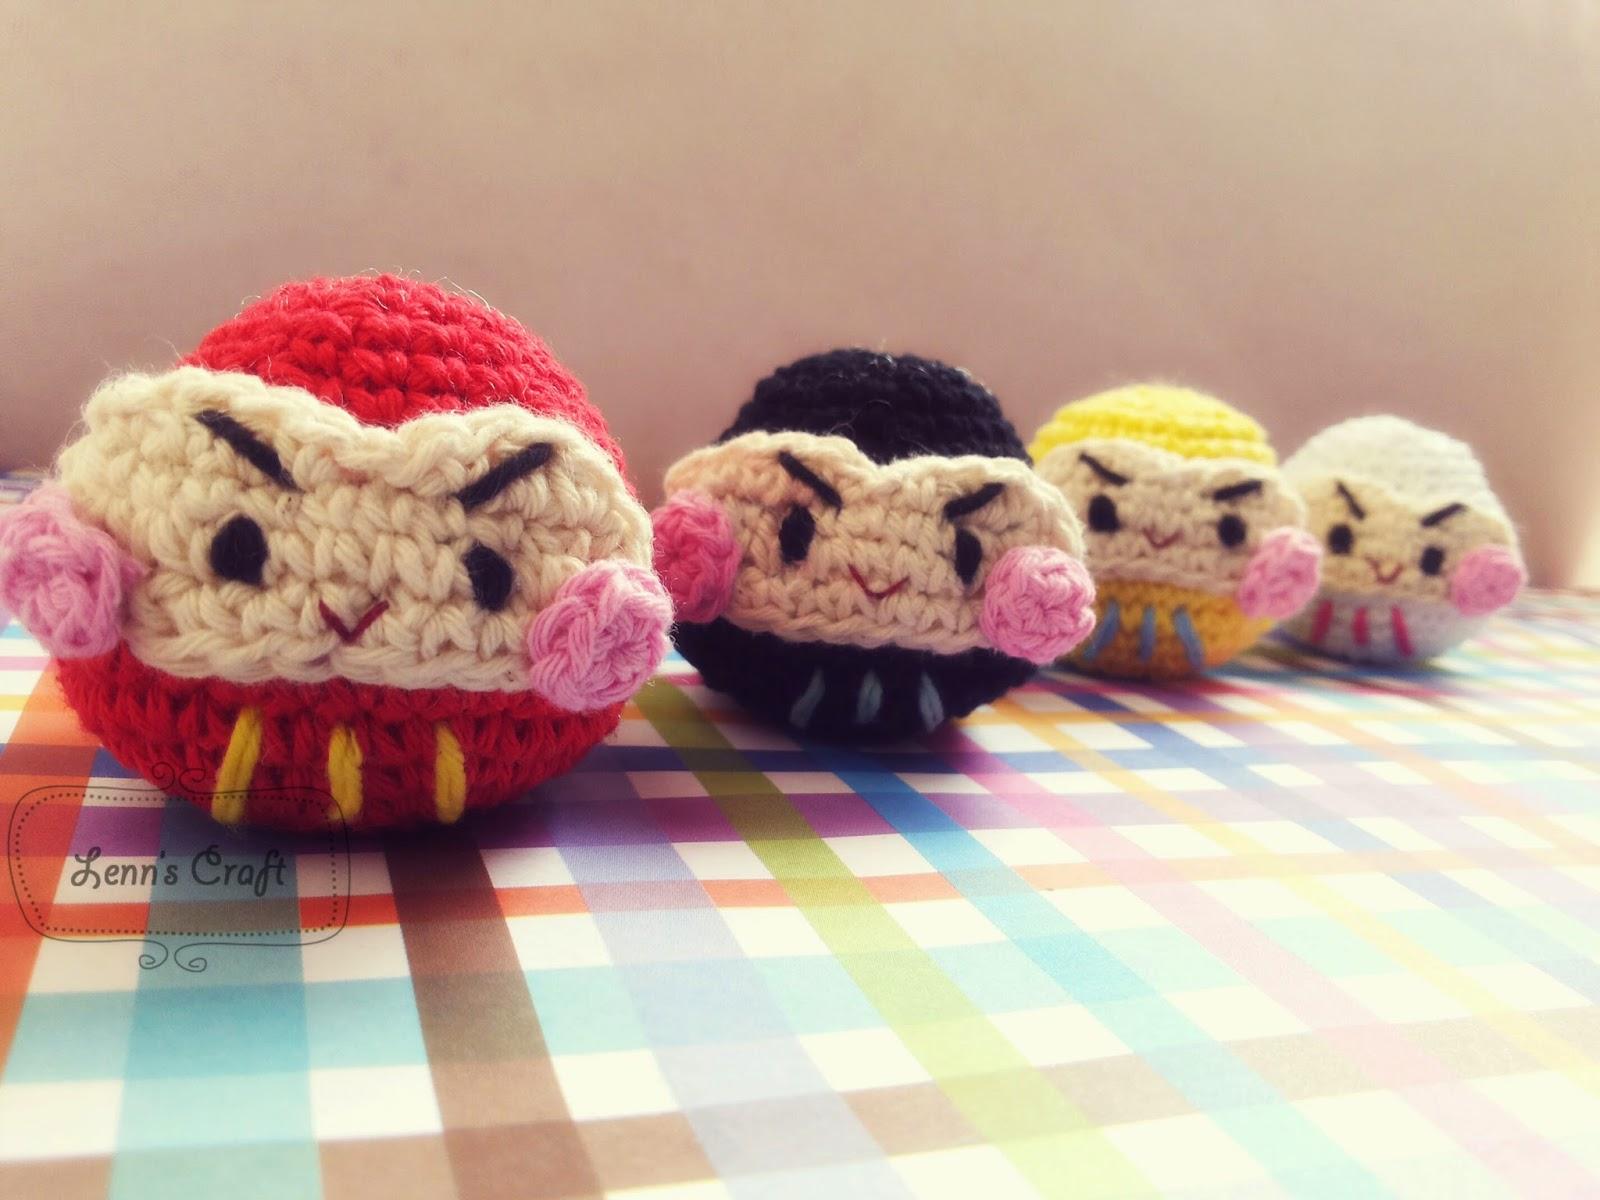 Amigurumi Japanese Meaning : Lenns Craft  Handmade doll Amigurumi  : Daruma ...